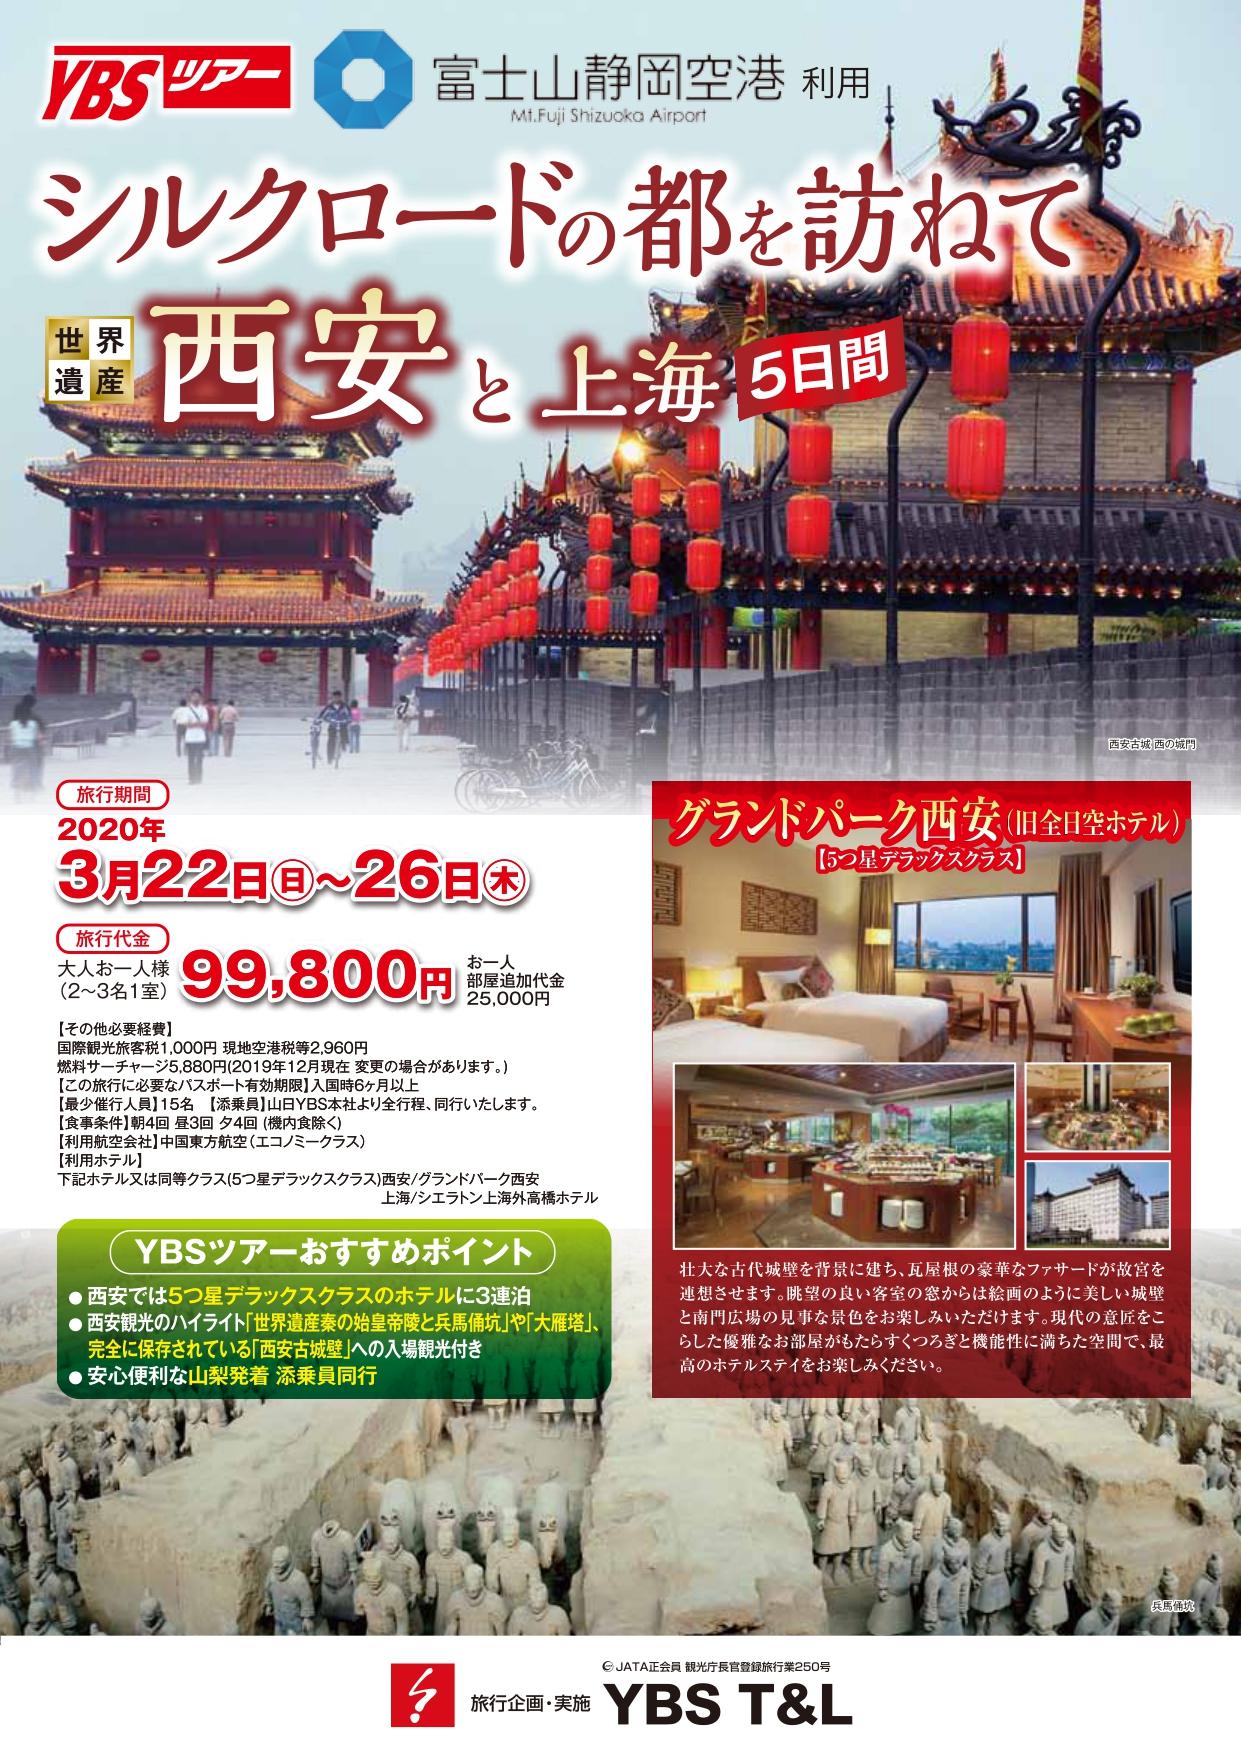 西安と上海 5日間